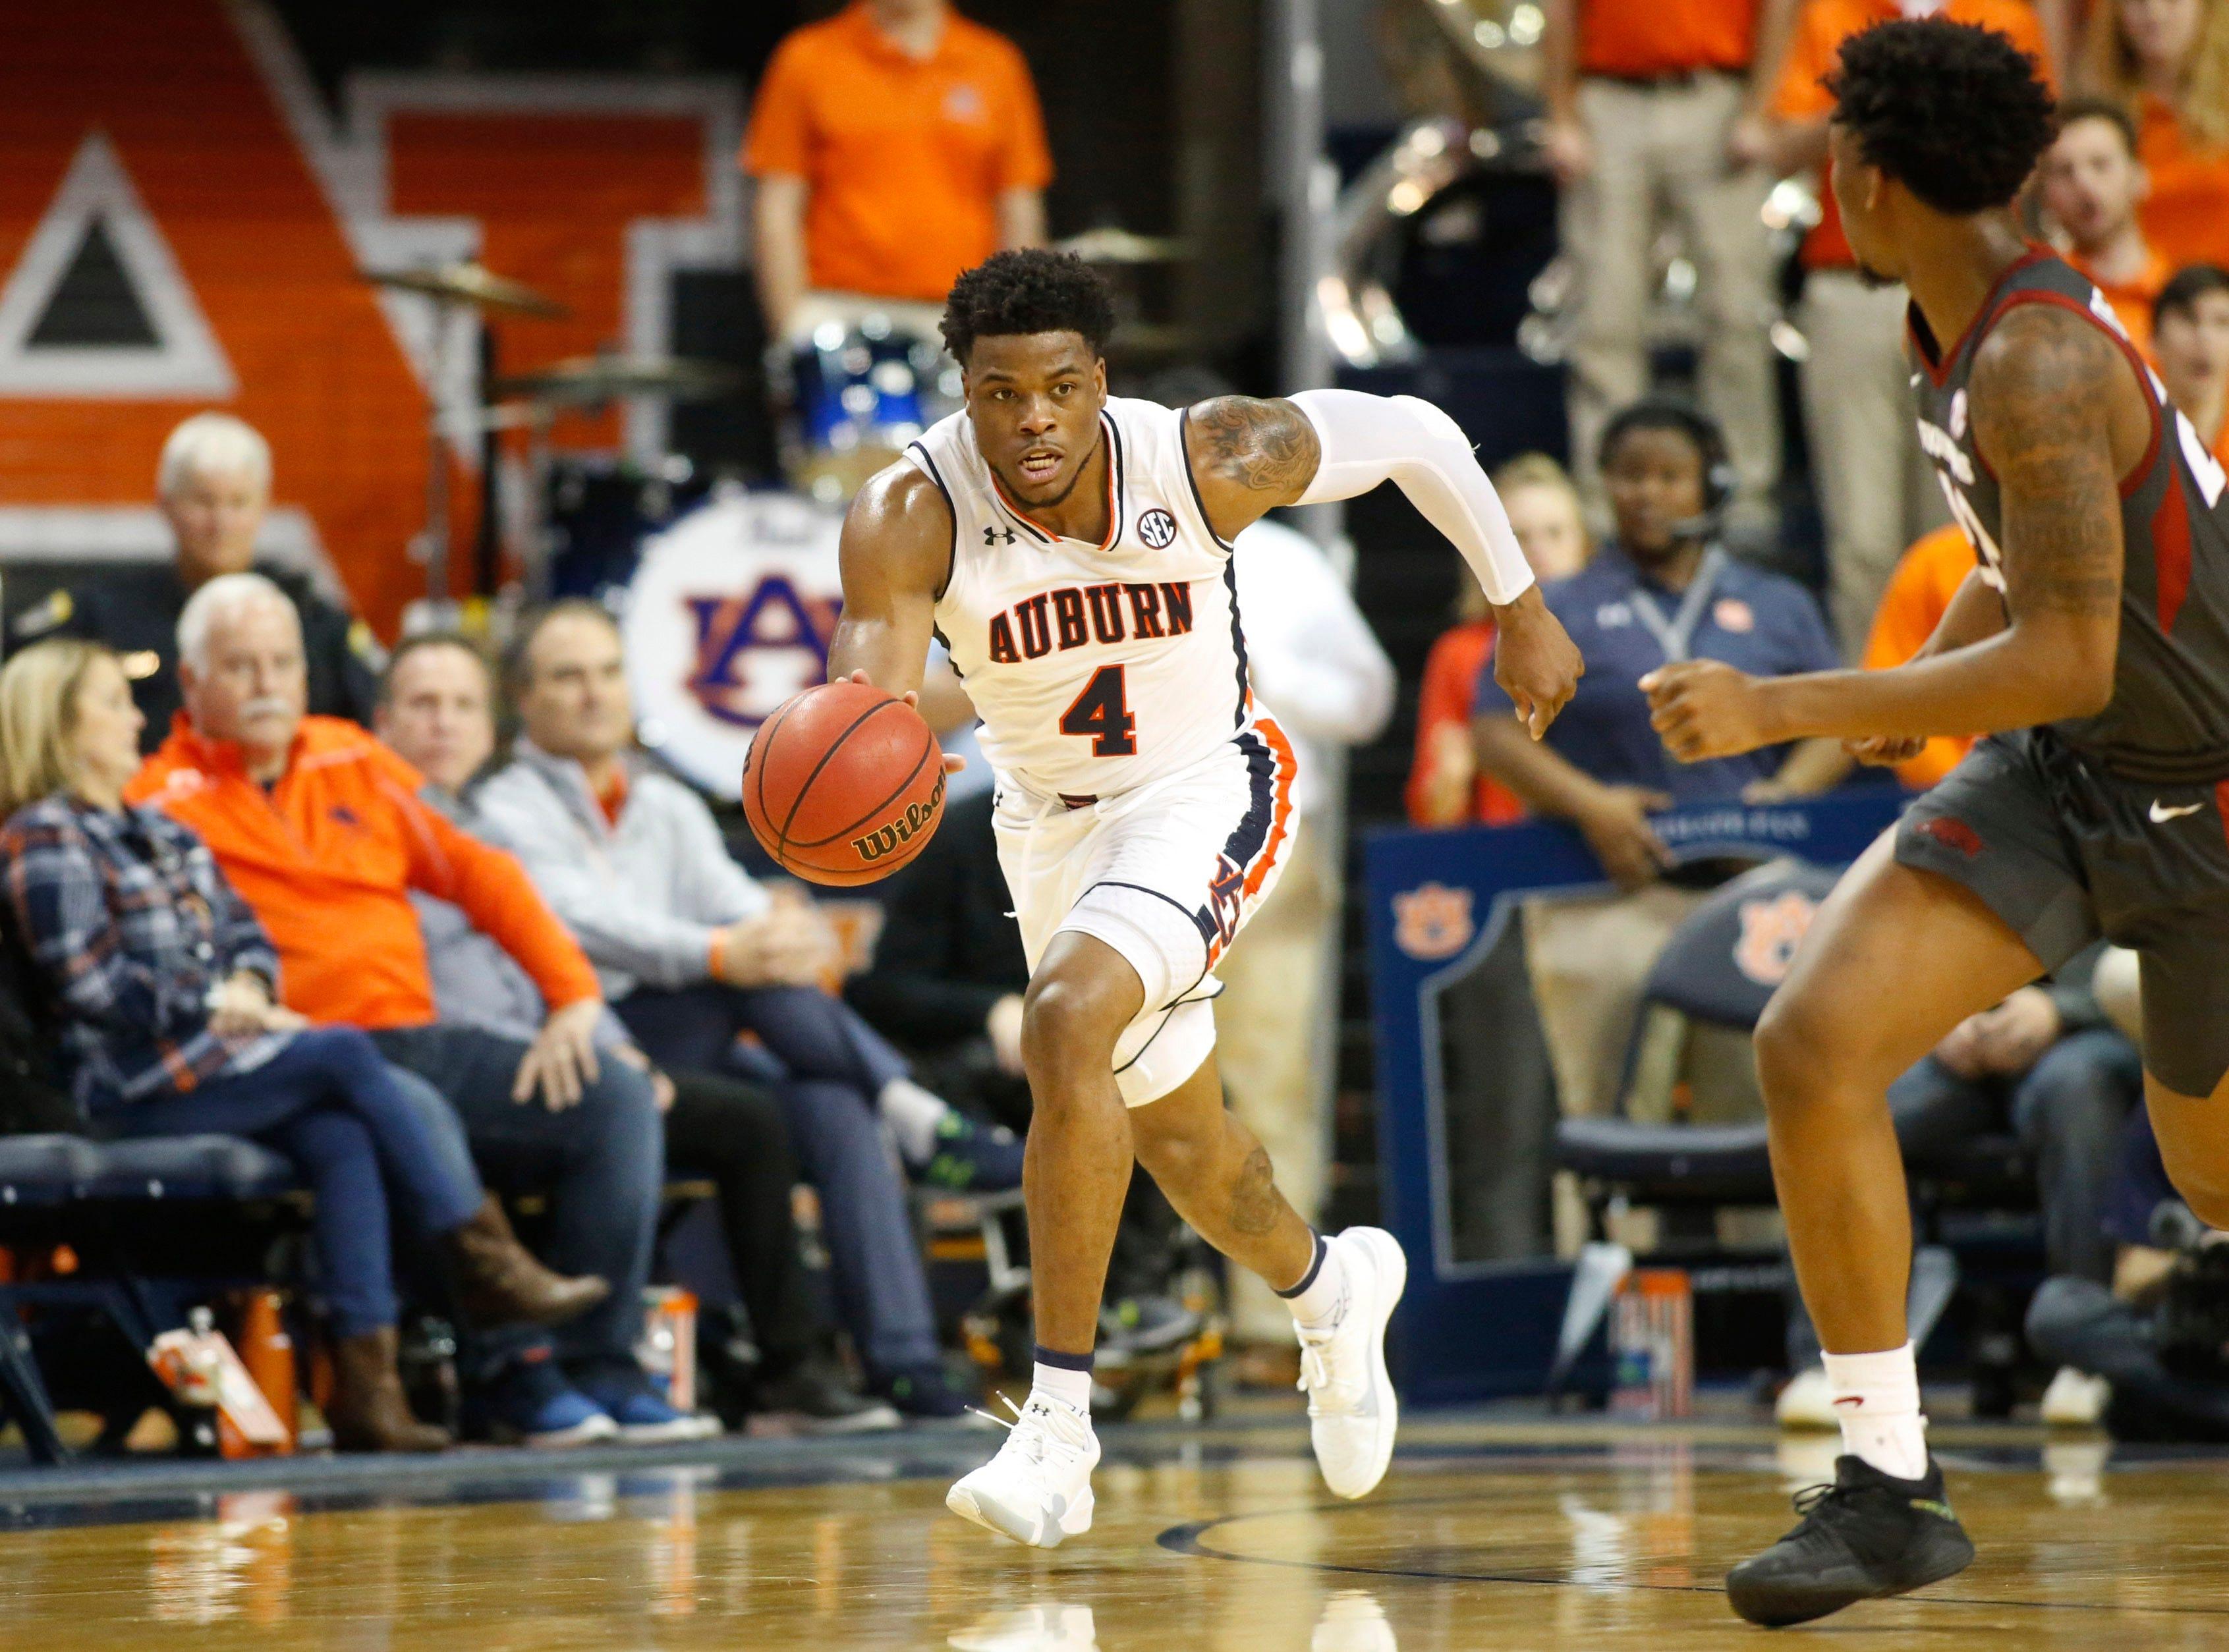 Feb 20, 2019; Auburn, AL, USA; Auburn Tigers forward Malik Dunbar (4) runs a play against the Arkansas Razorbacks during the second half at Auburn Arena. Mandatory Credit: John Reed-USA TODAY Sports